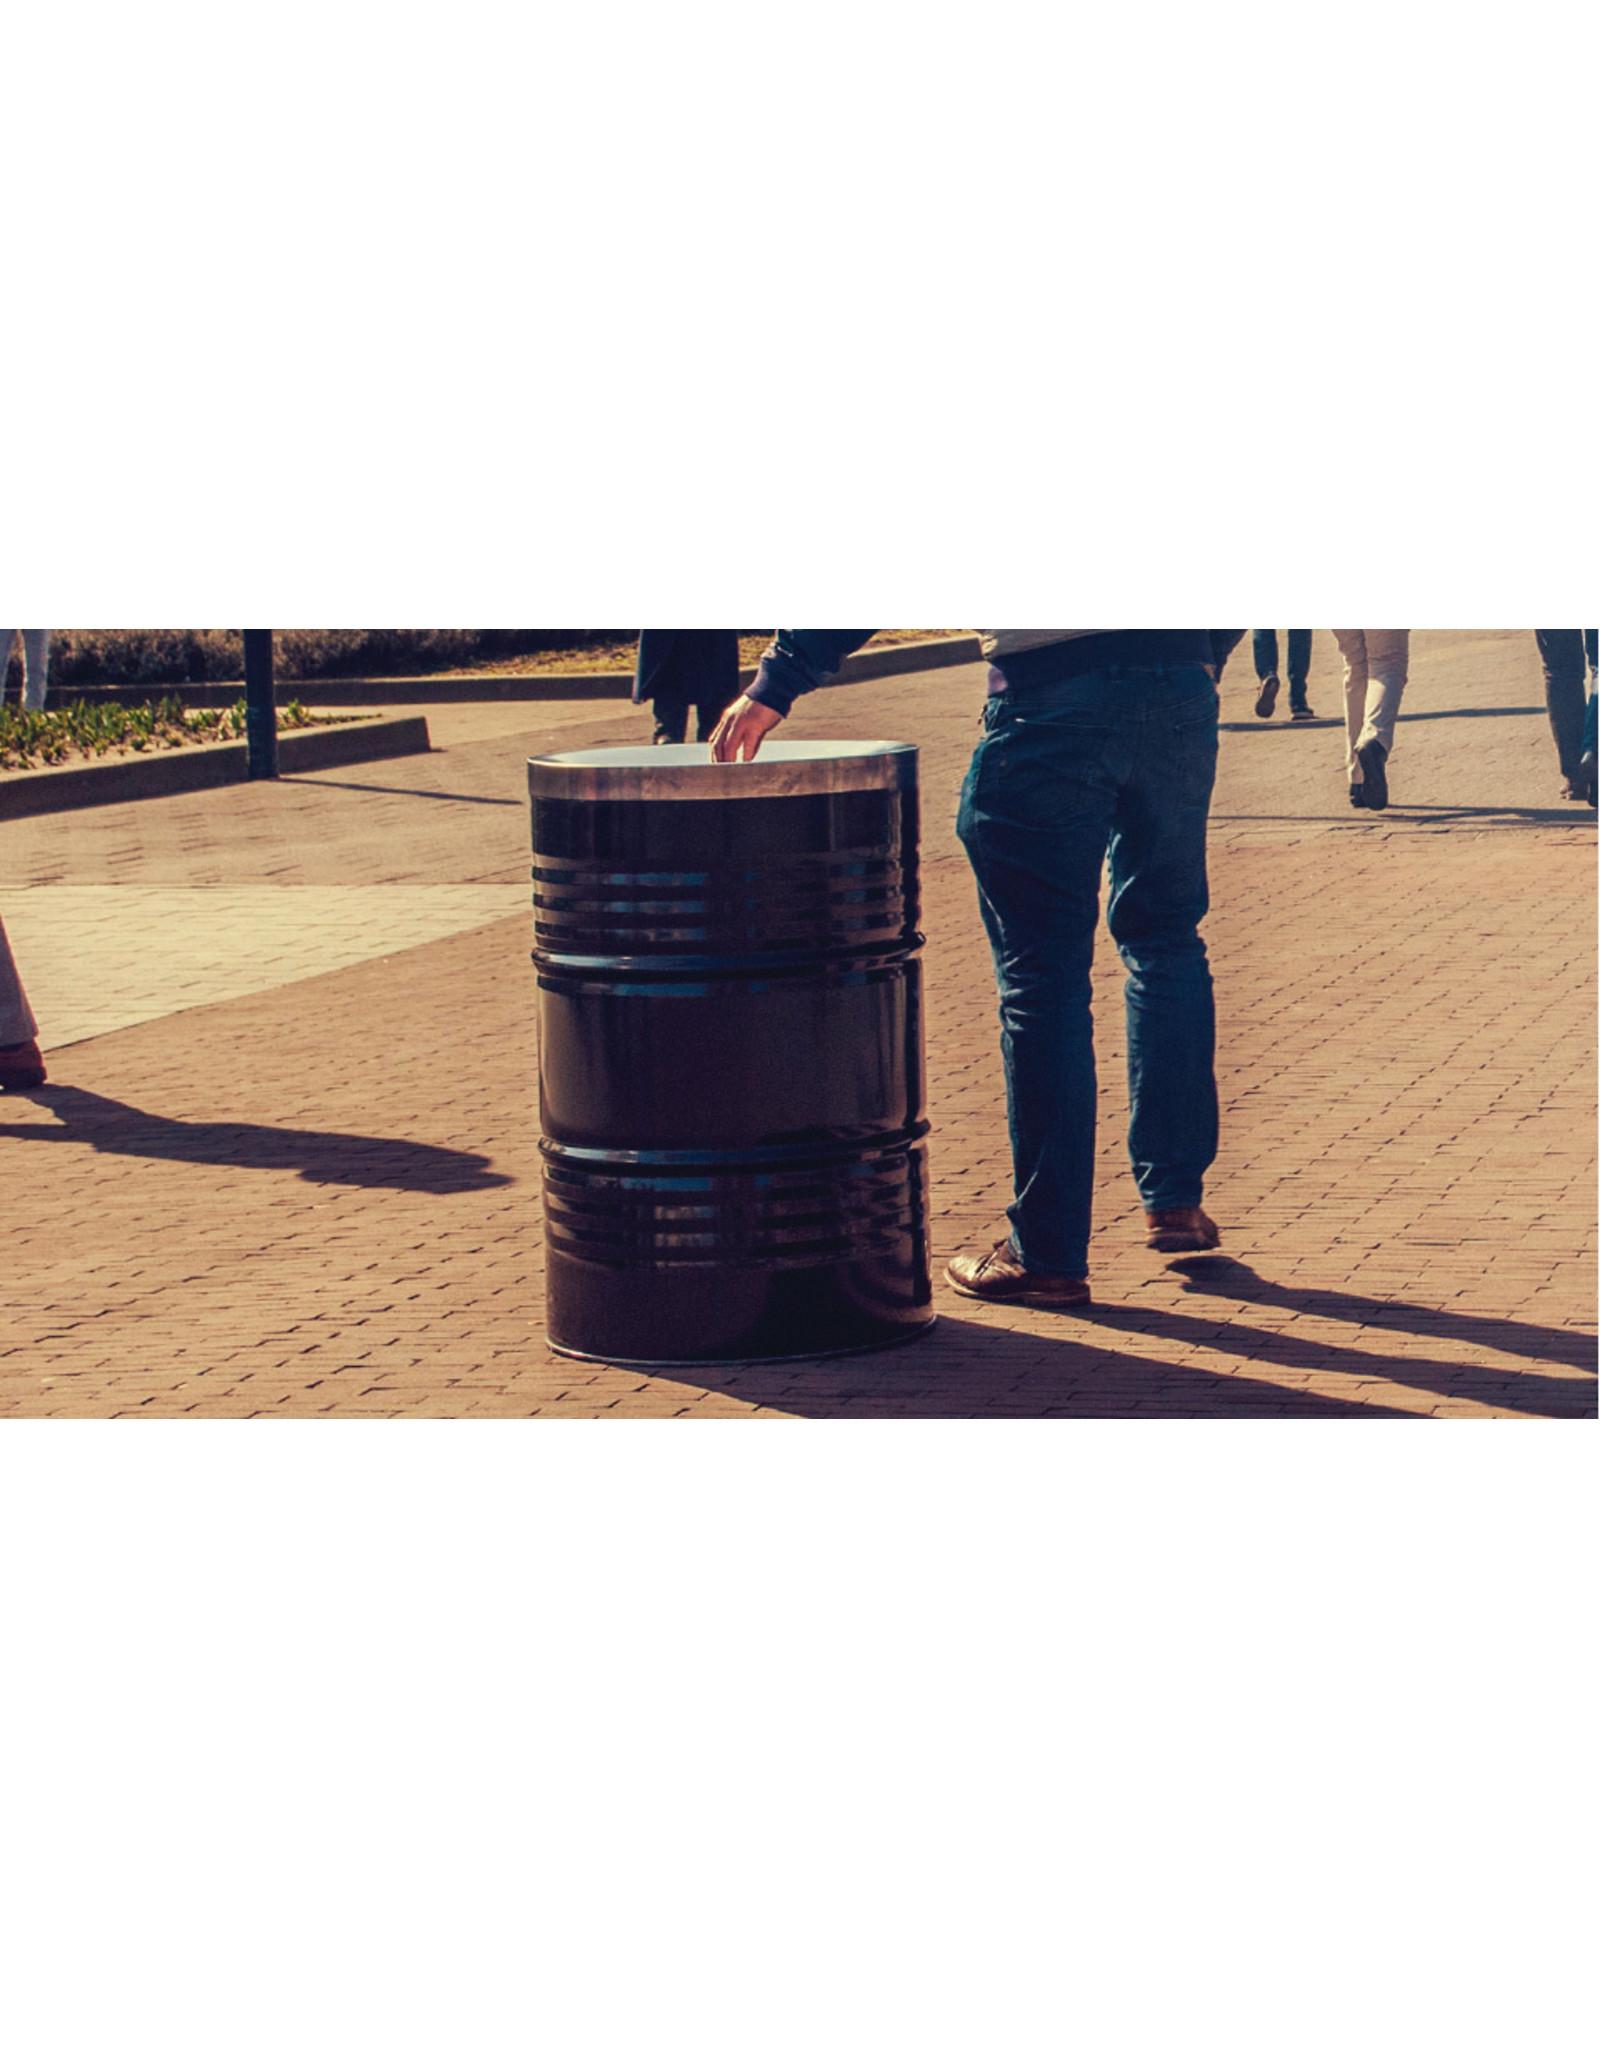 Barrelkings  BinBin industrial rubbish bin black, 200L with flame-retardant lid